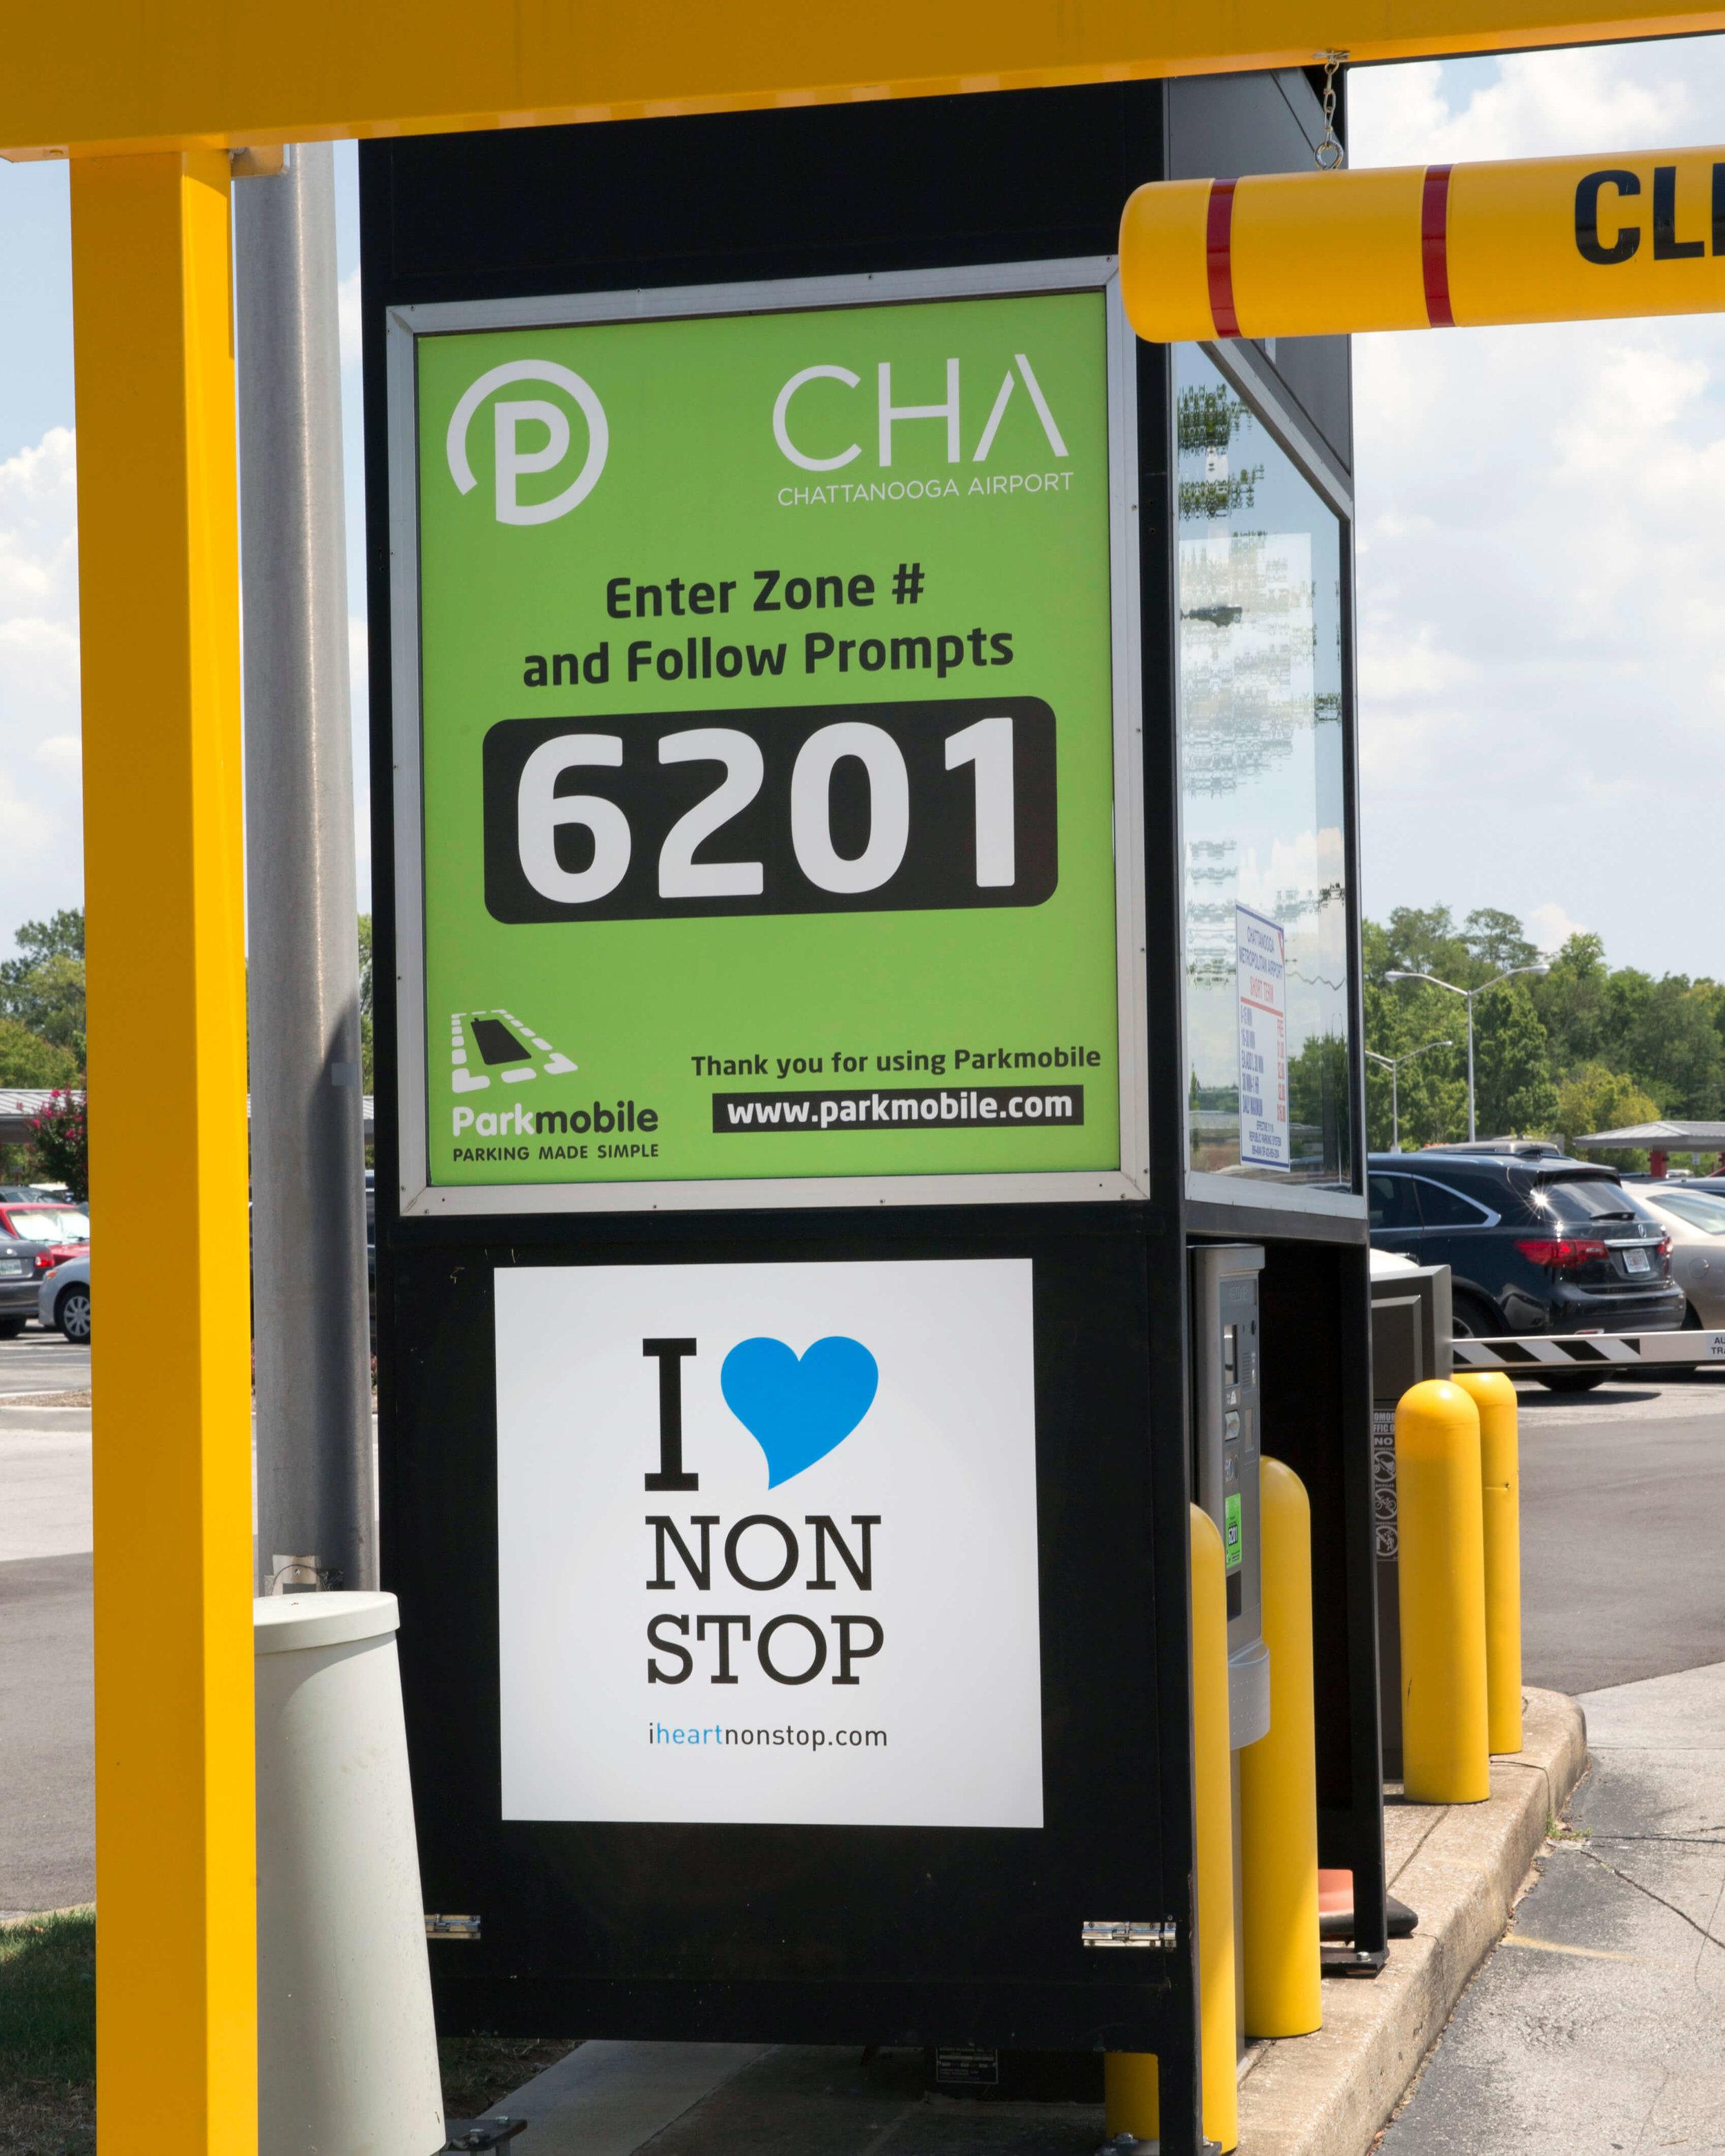 ChattanoogaAirport-IHeartNonstop-Signage5.jpg